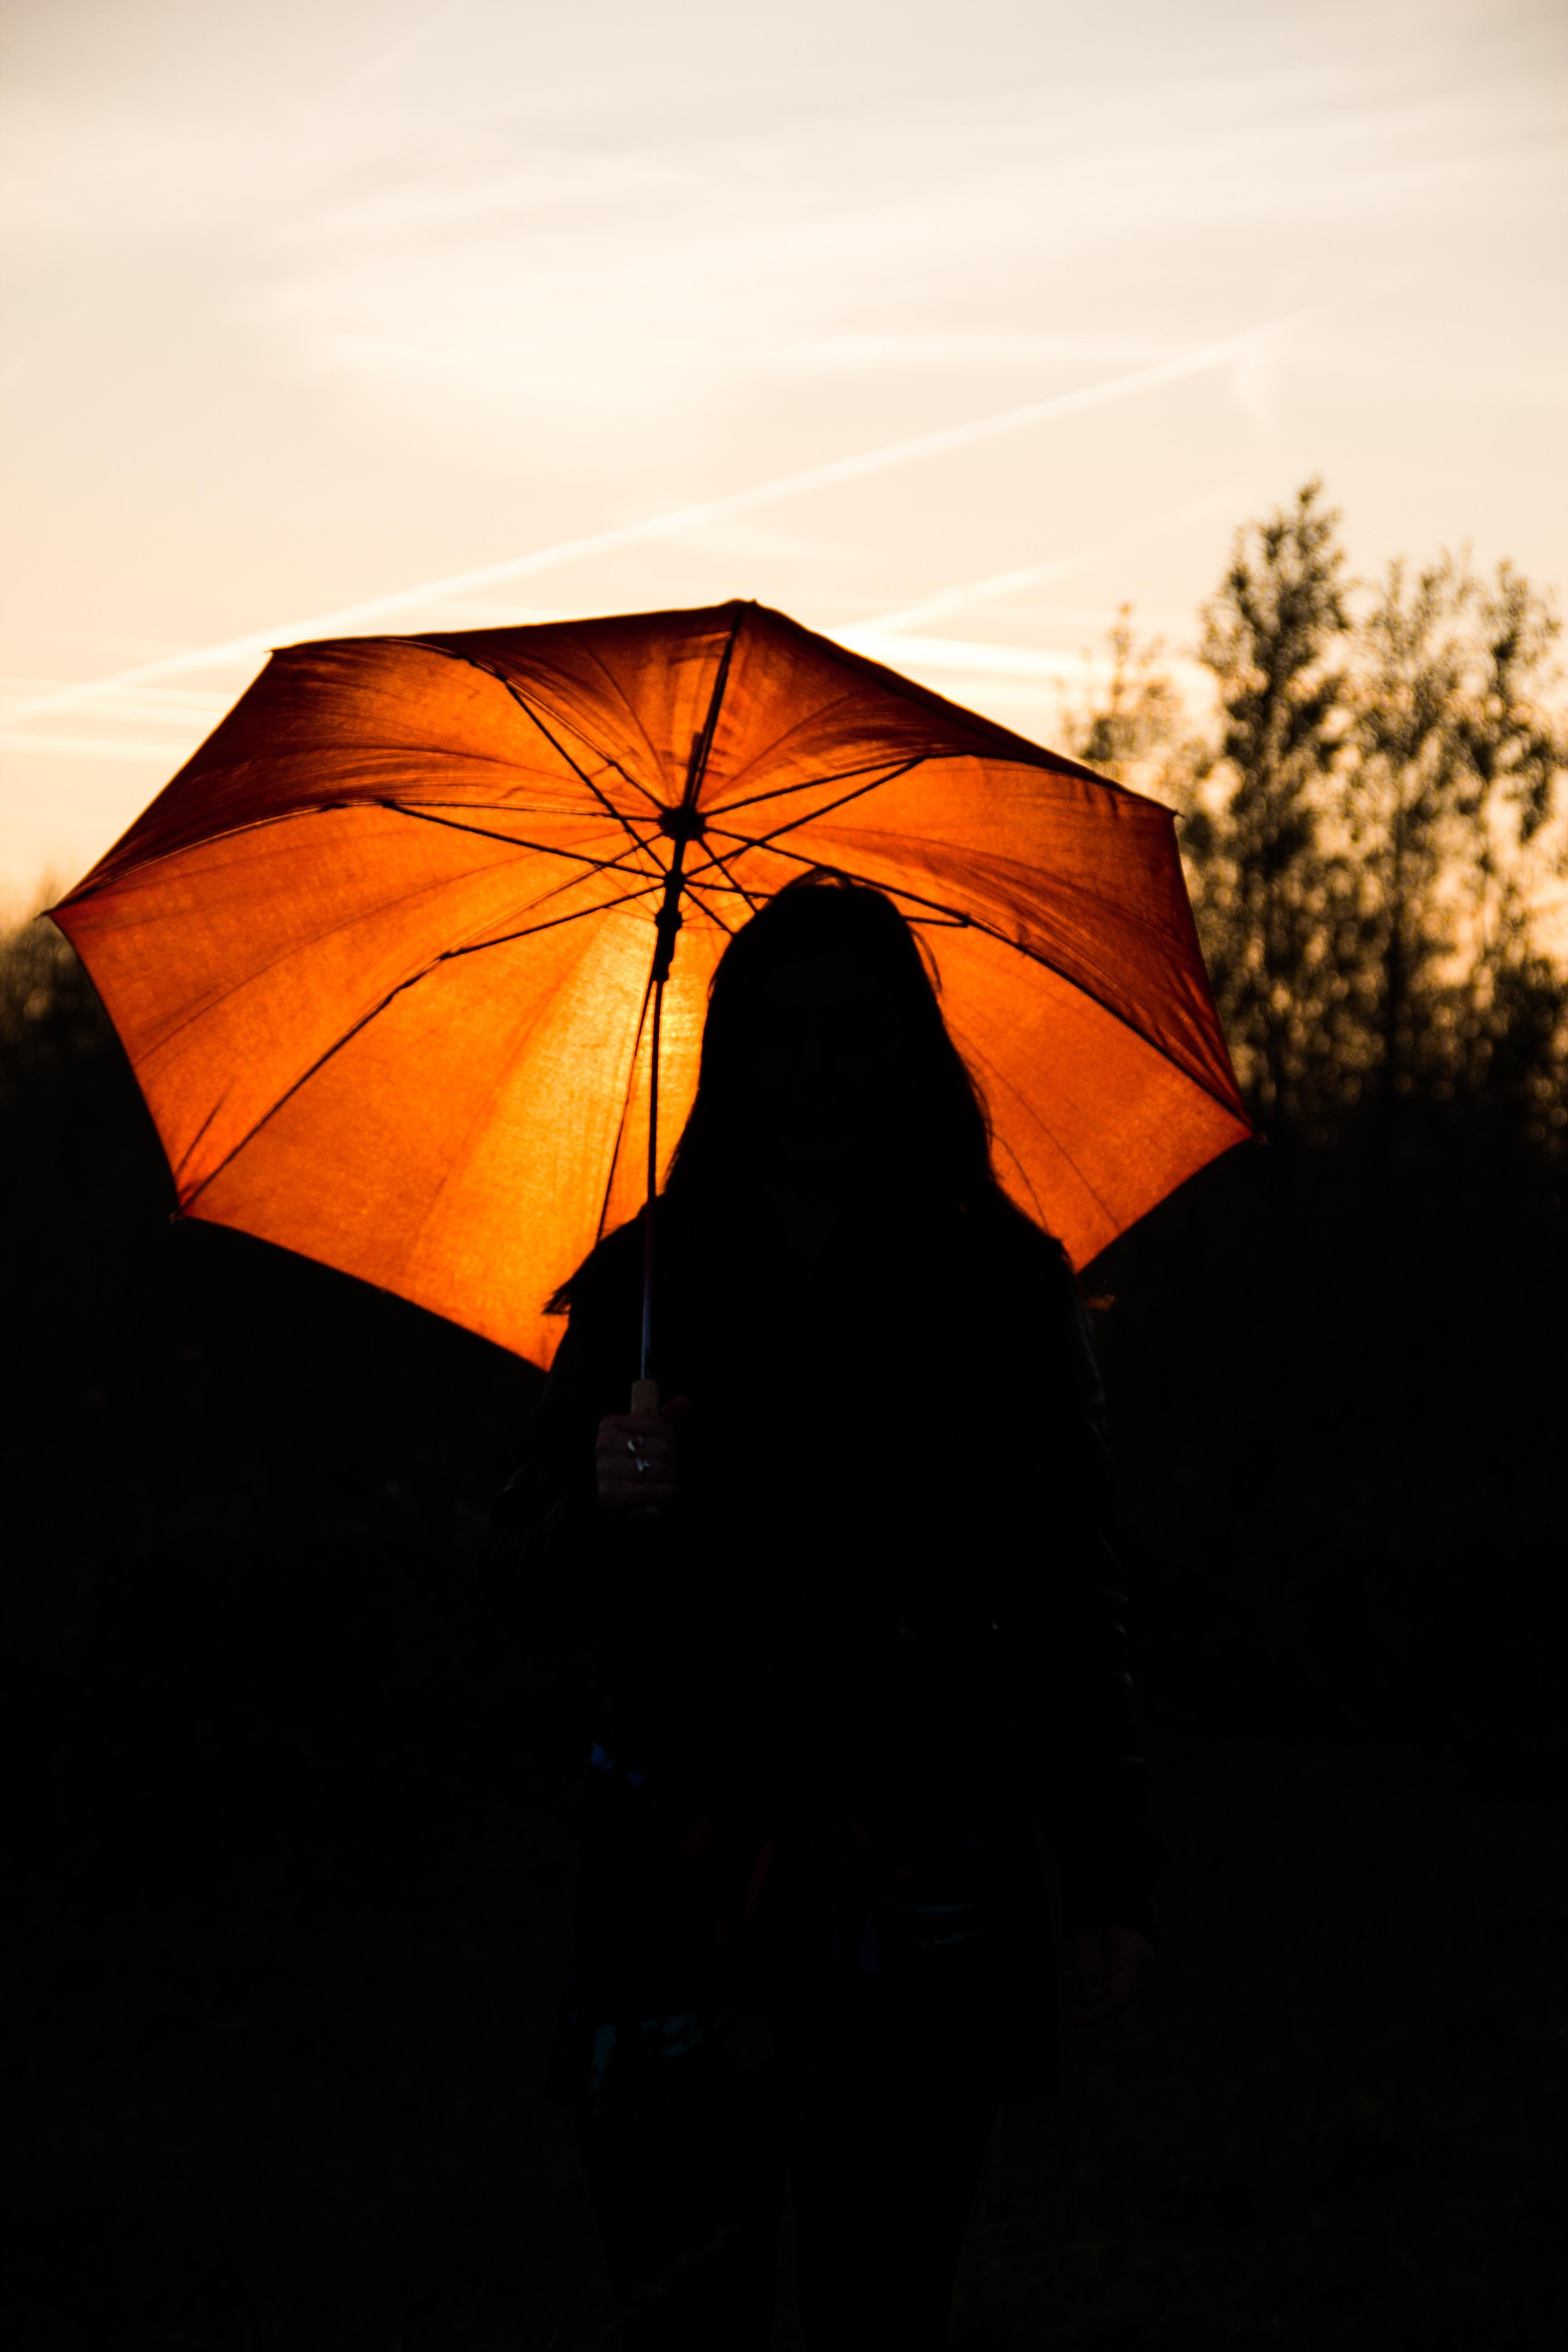 b5debee23 silhouette sky sun sunset sunlight leaf orange red umbrella color autumn  yellow sunny setting sun colorful